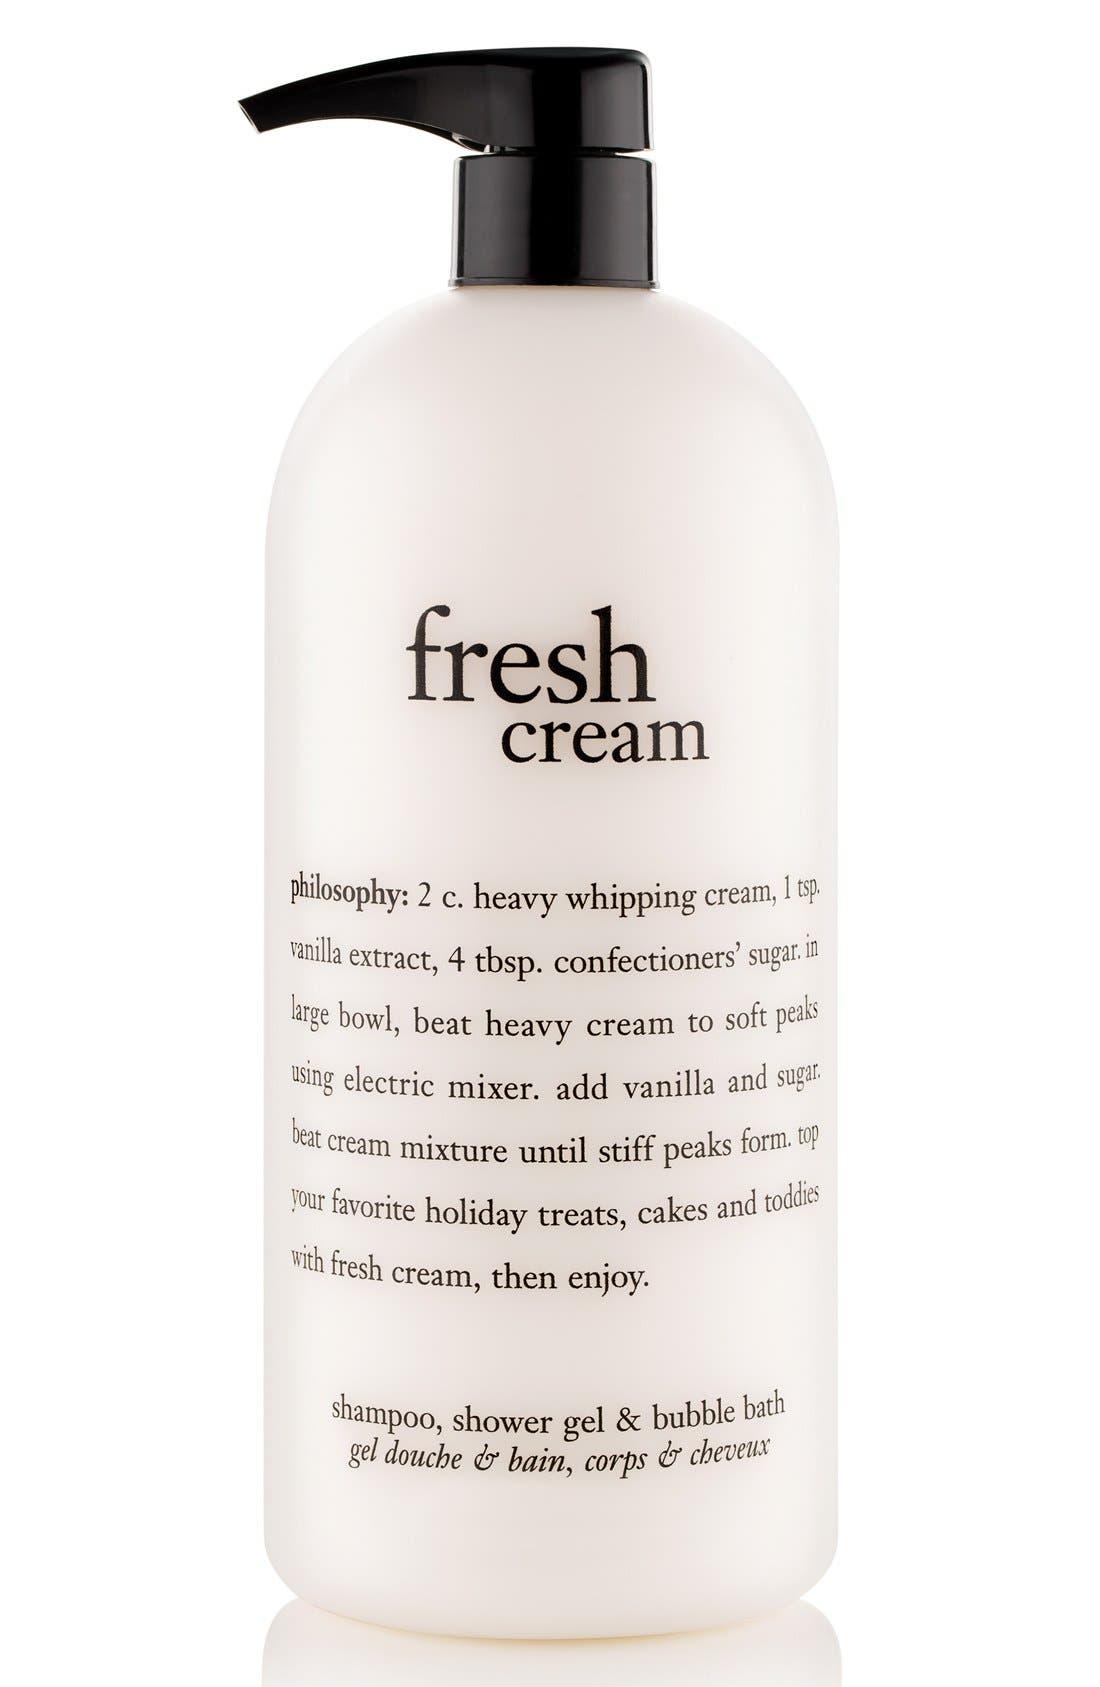 PHILOSOPHY 'fresh cream' shampoo, shower gel & bubble bath, Main, color, NO COLOR